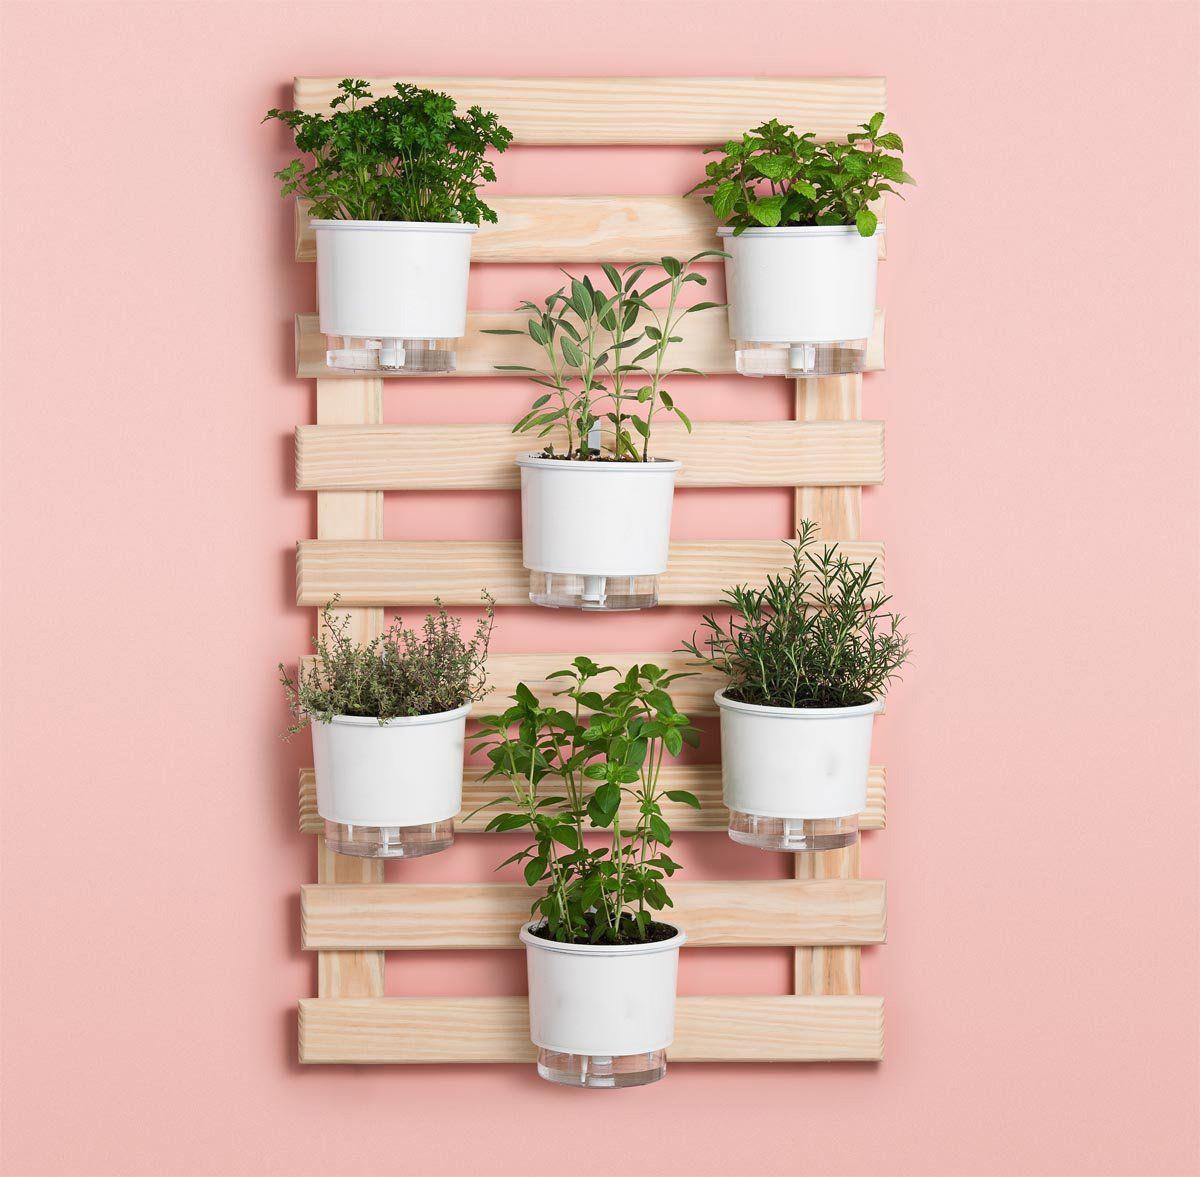 Kit Horta Vertical 6 Vasos Brancos 100cm x 60cm Acompanha: Treliça + Vasos + Suportes + Substrato + Sementes